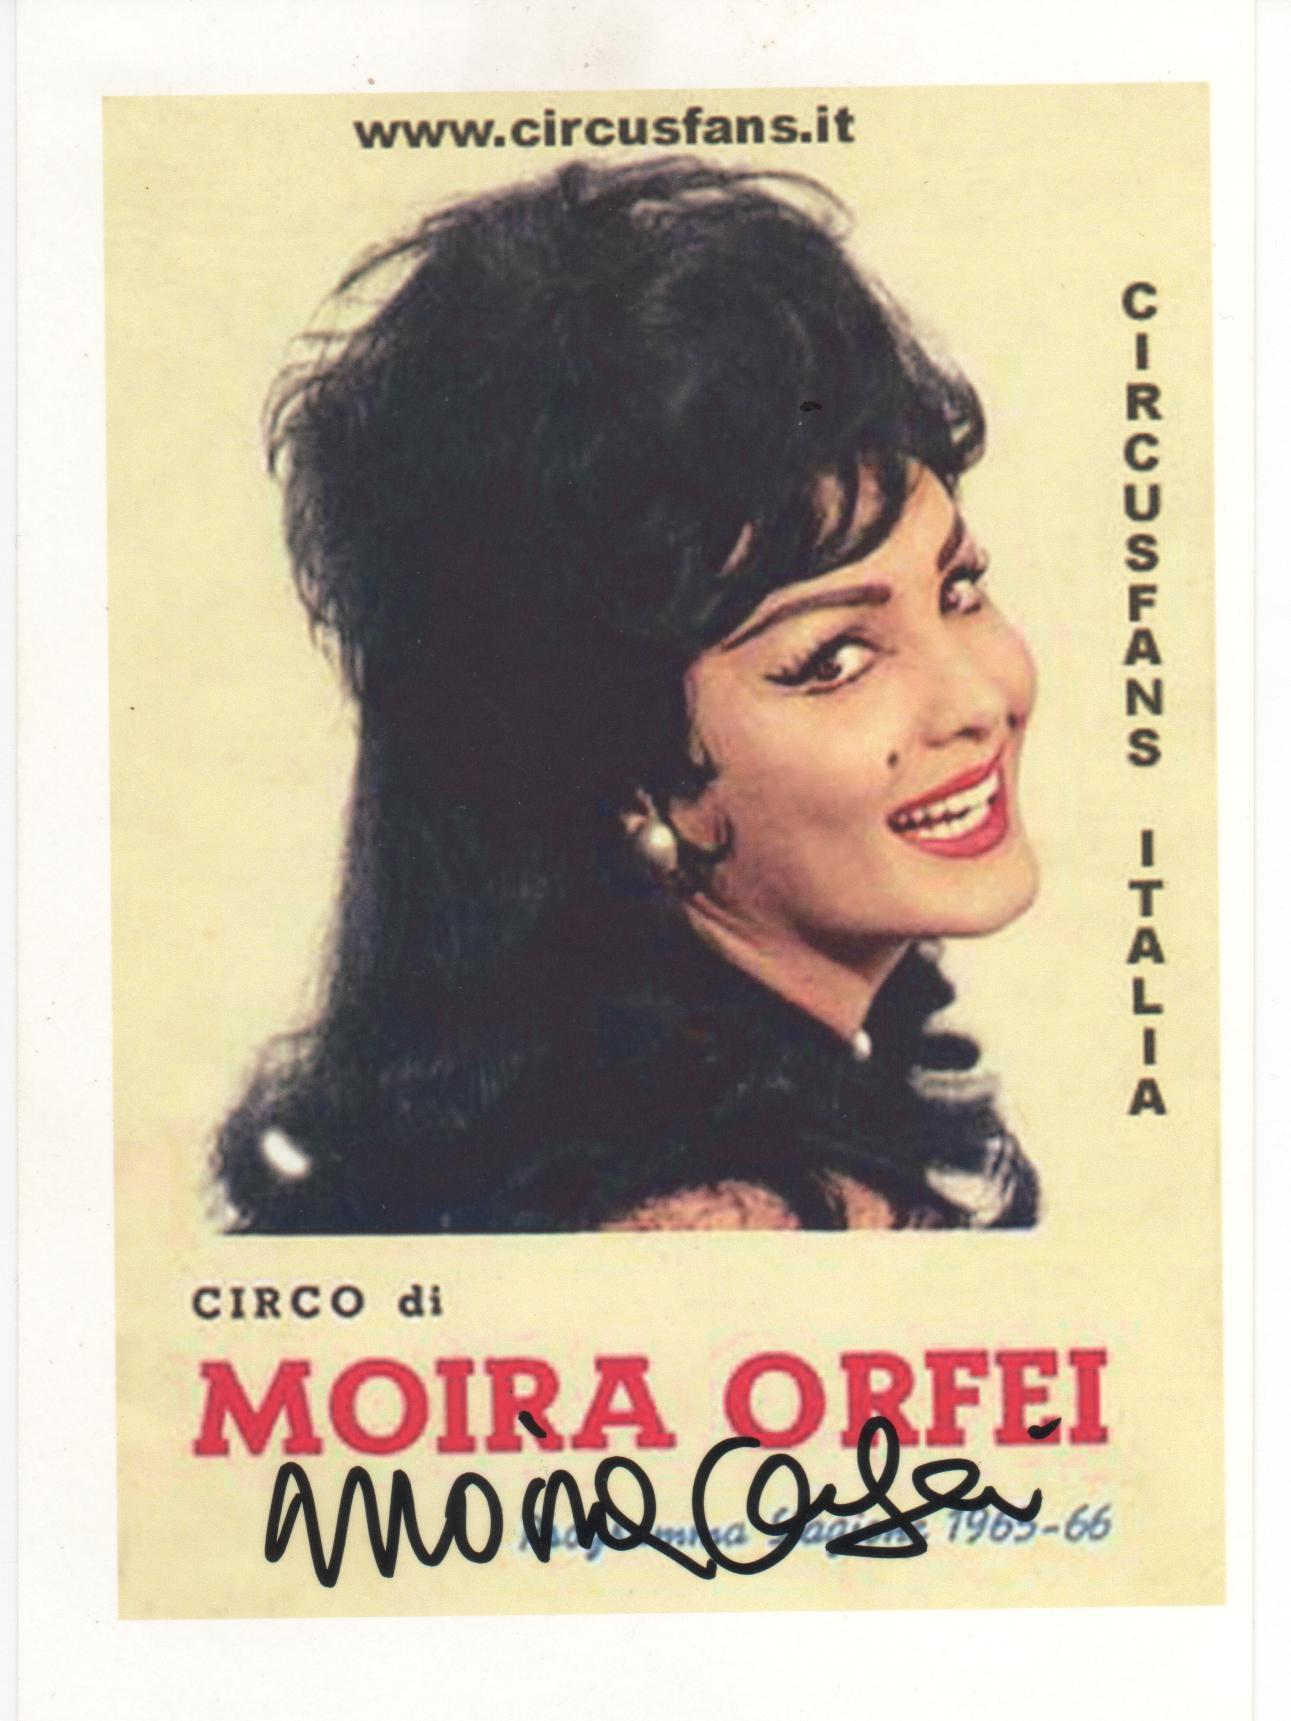 Moira orfei senza trucco foto 74